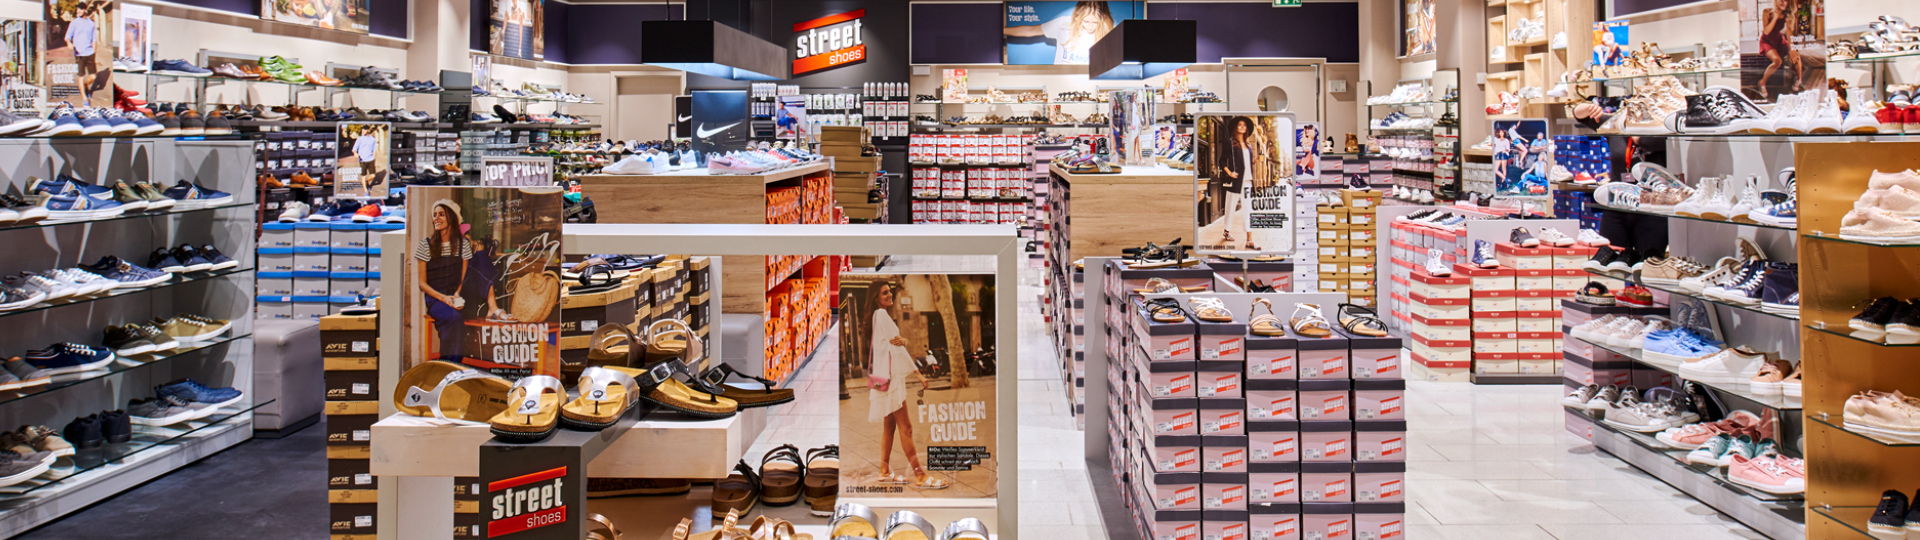 street shoes Kienast Unternehmensgruppe